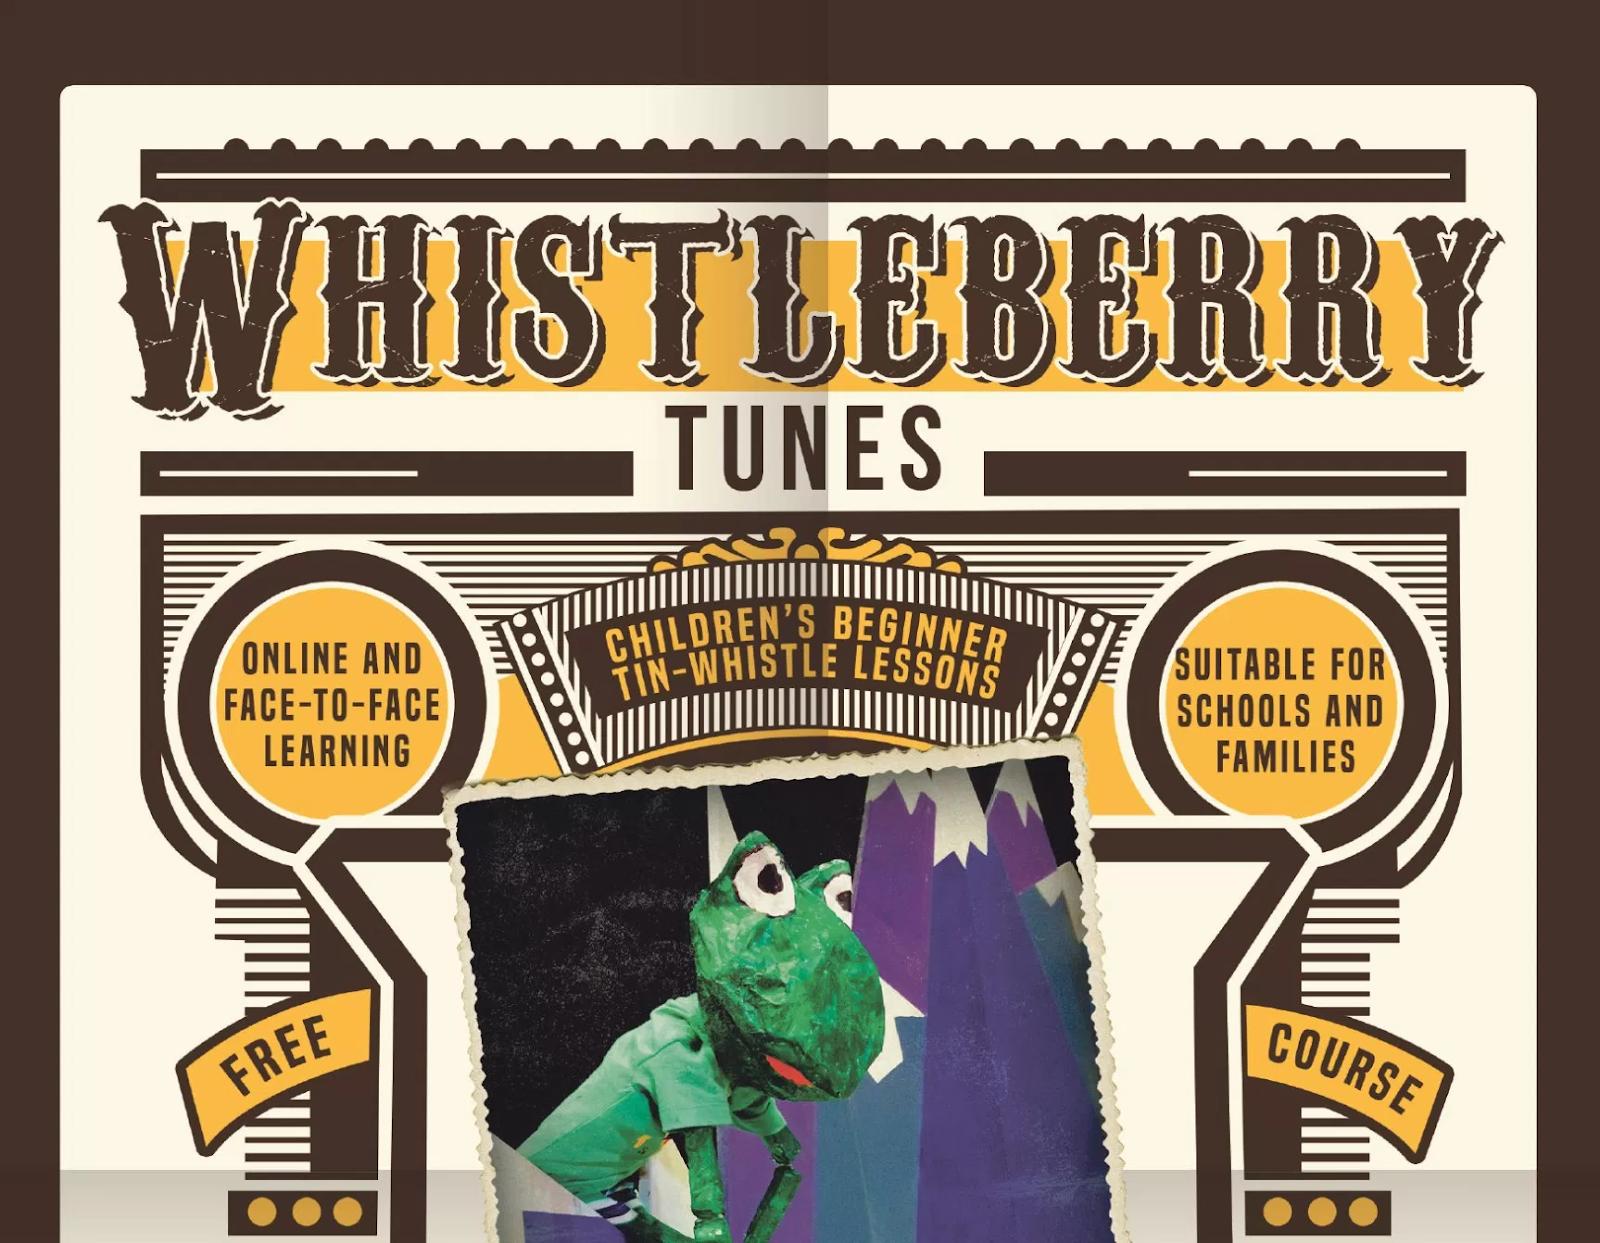 Dabbledoo Music - Whistleberry tunes - learn tin whistle